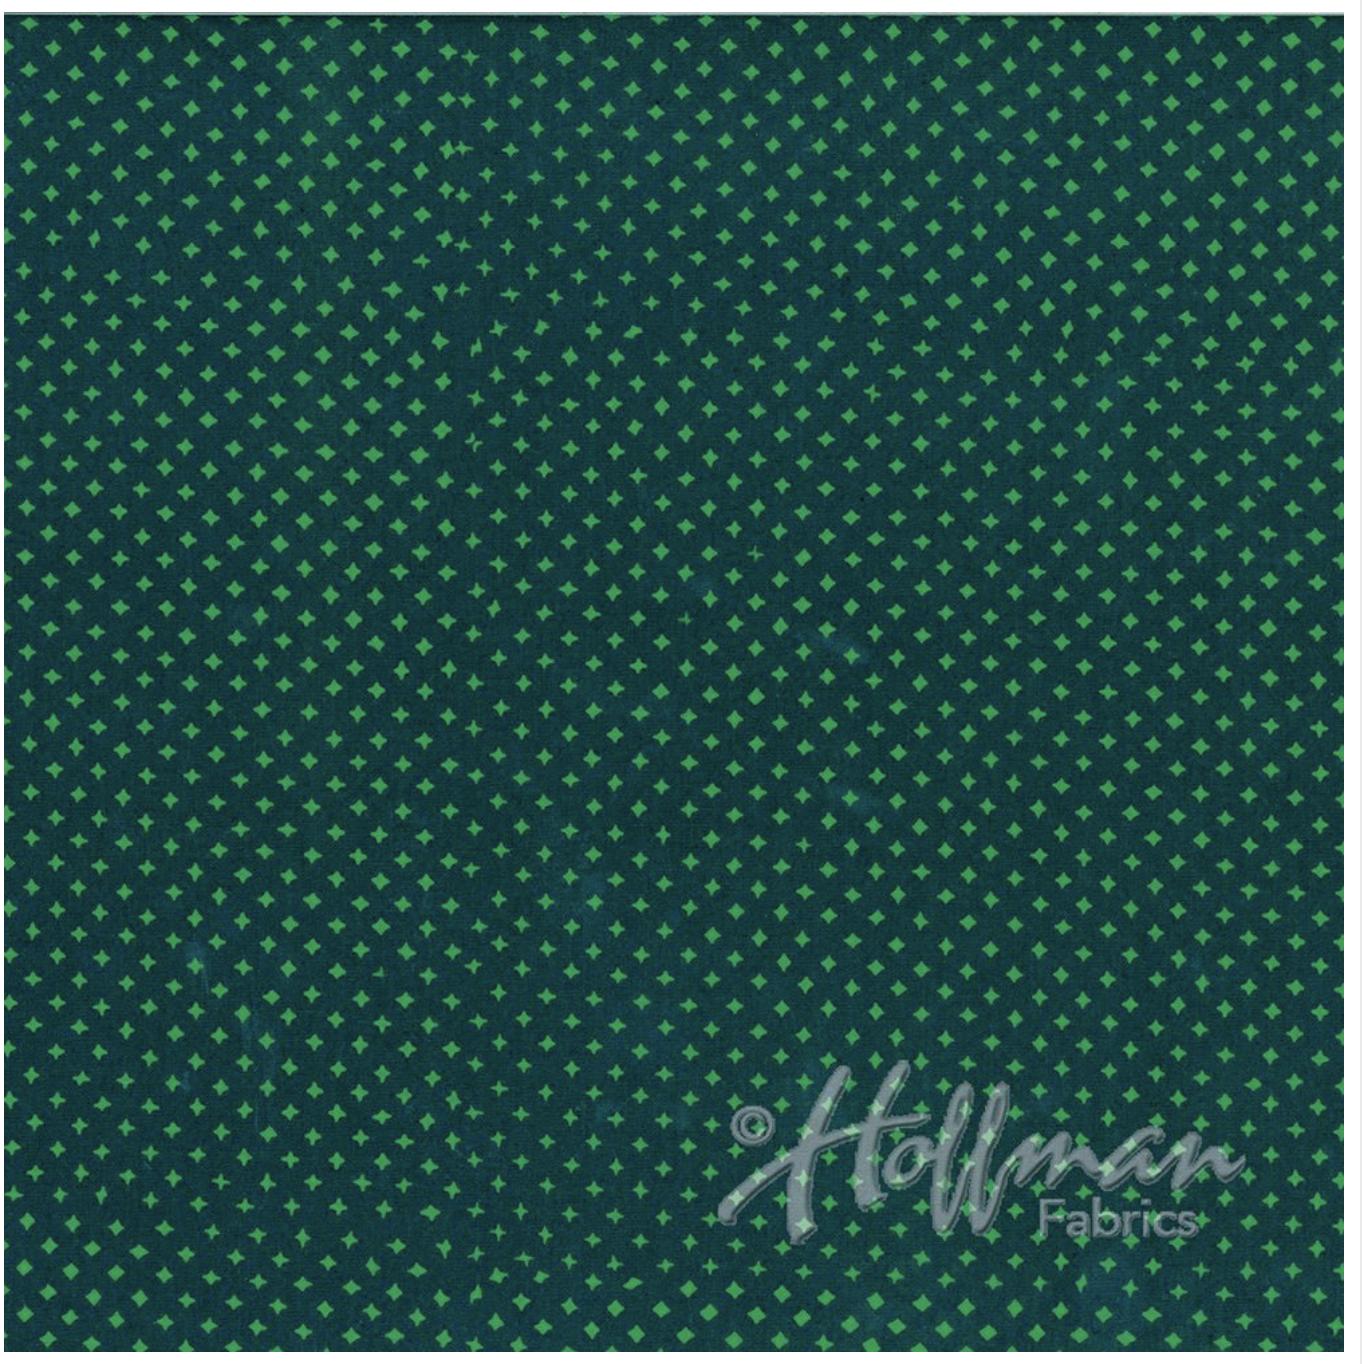 T's Spruce - Hand Dyed Batiks - Me + You Hoffman Fabrics 130-90